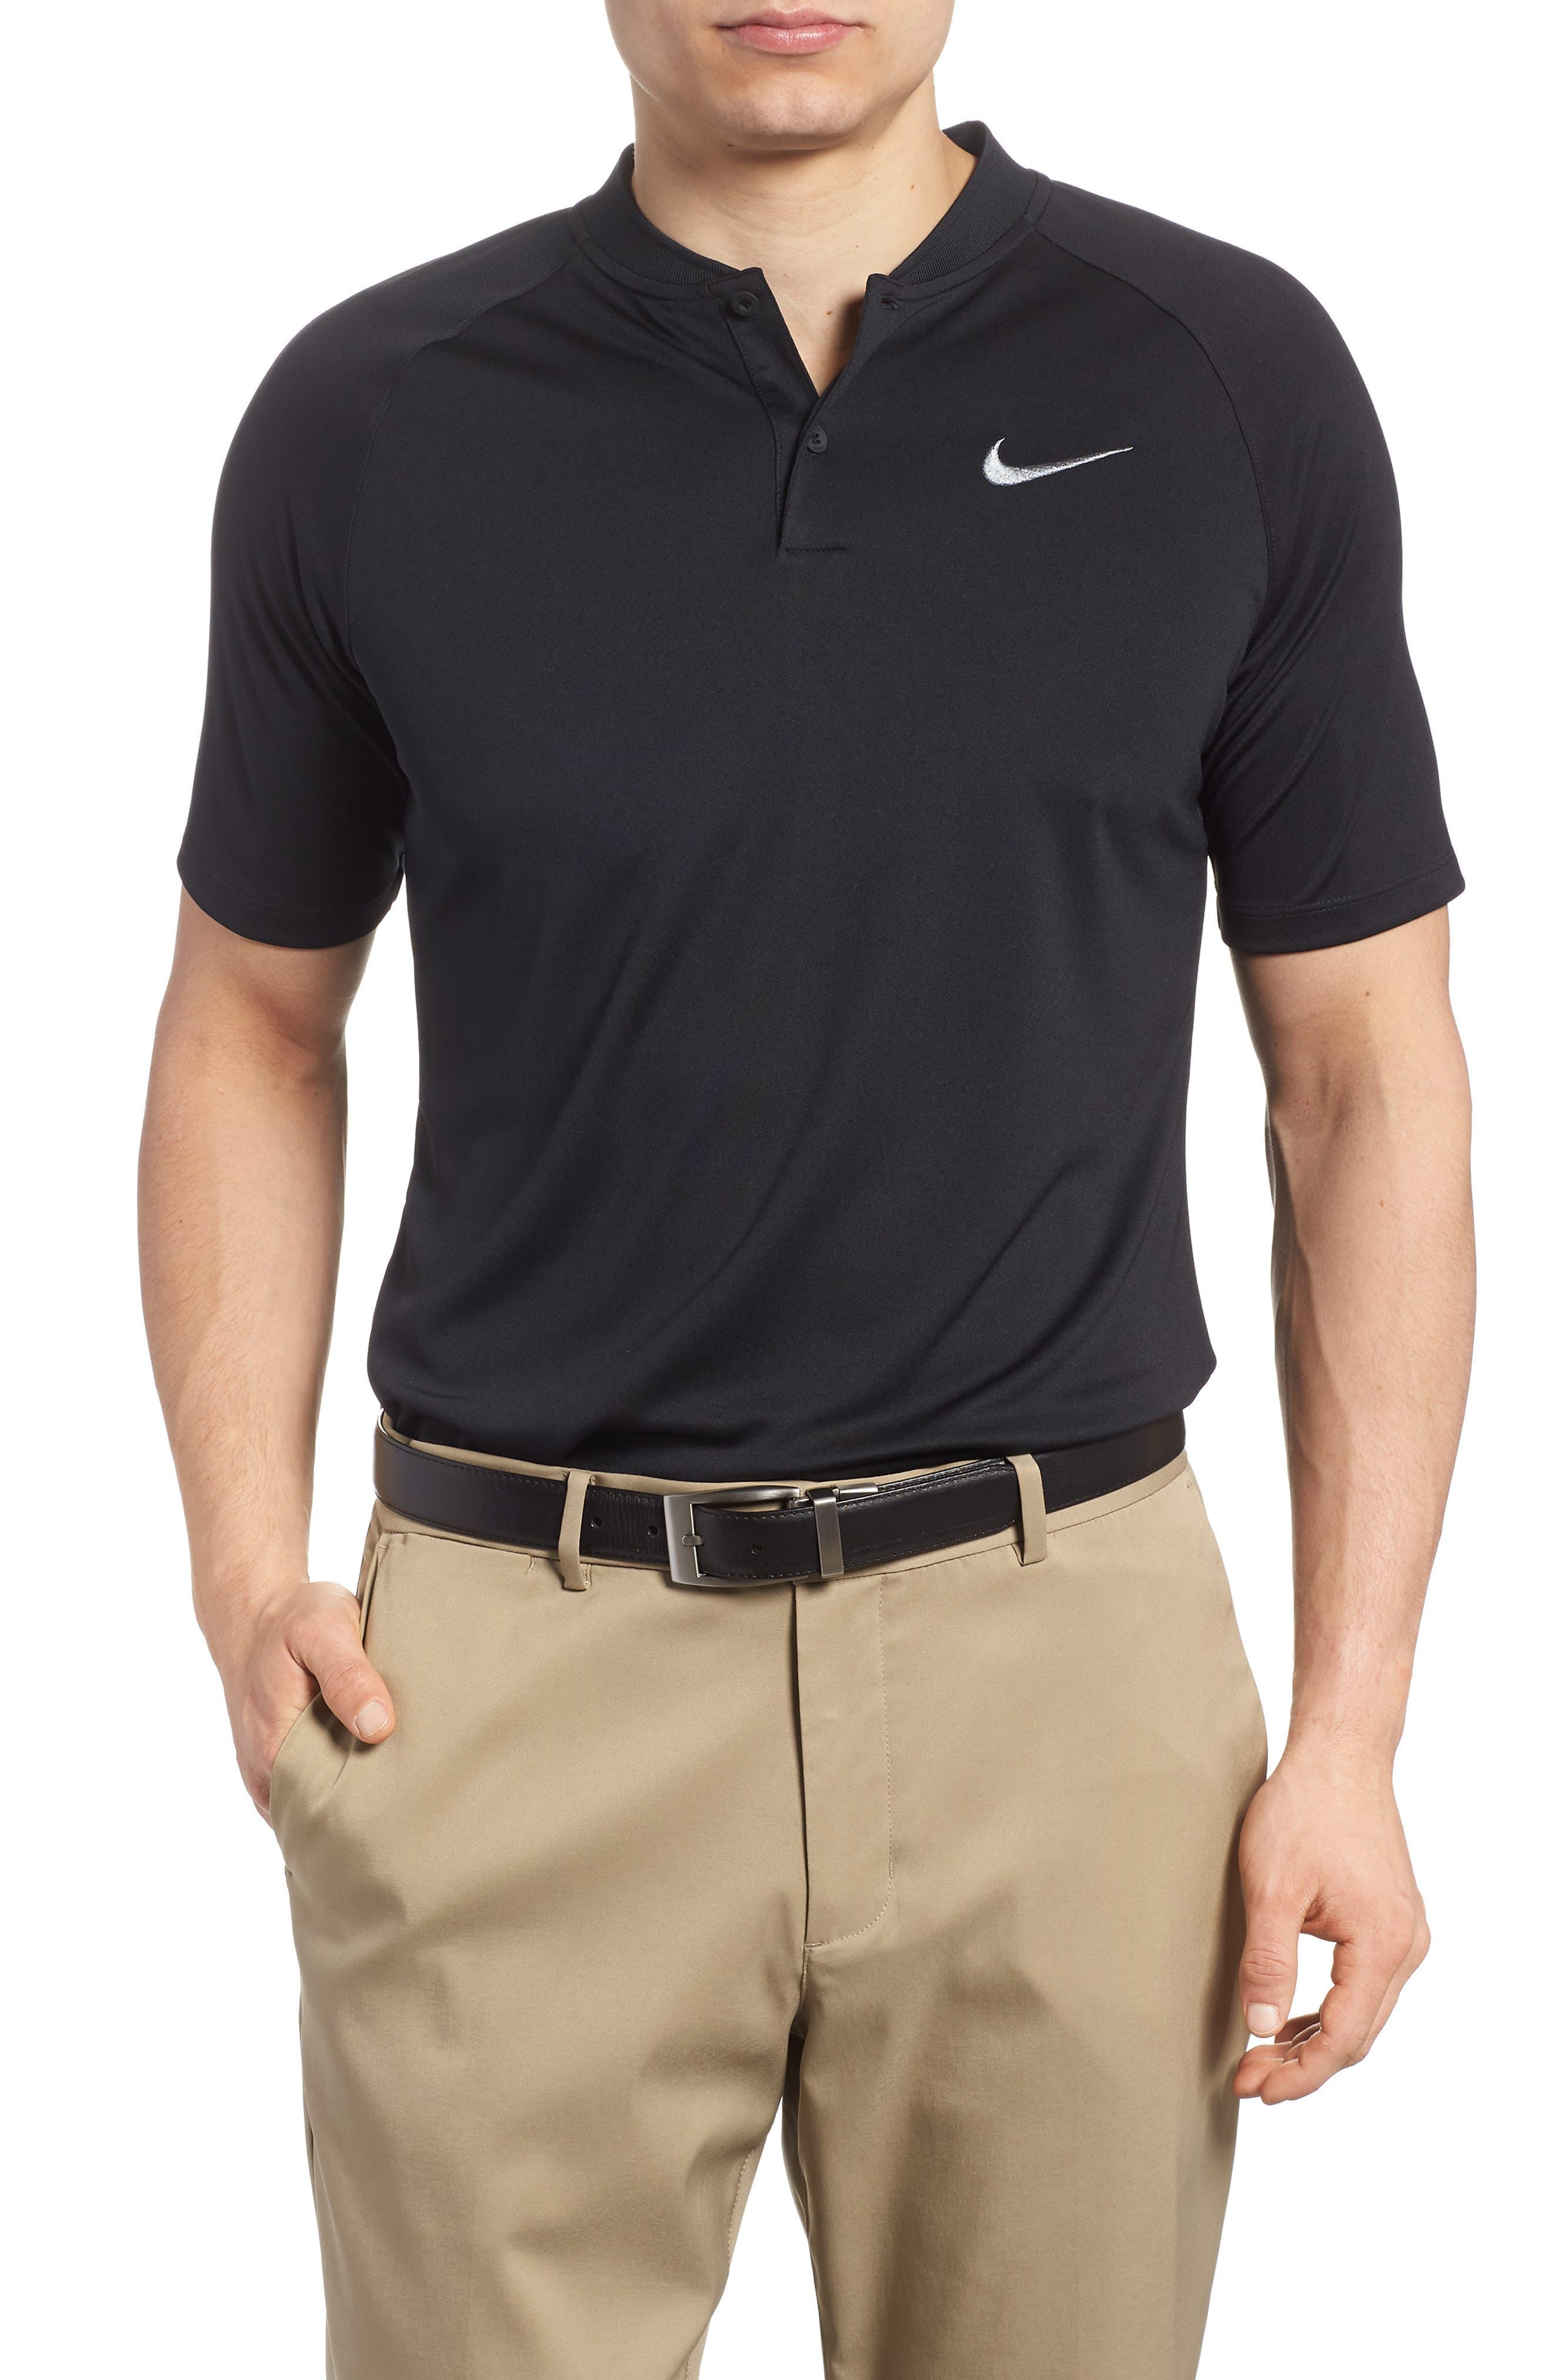 NIKE, Momentum Dri-FIT Golf Polo, Main thumbnail 1, color, BLACK/ BLACK/ GUNSMOKE